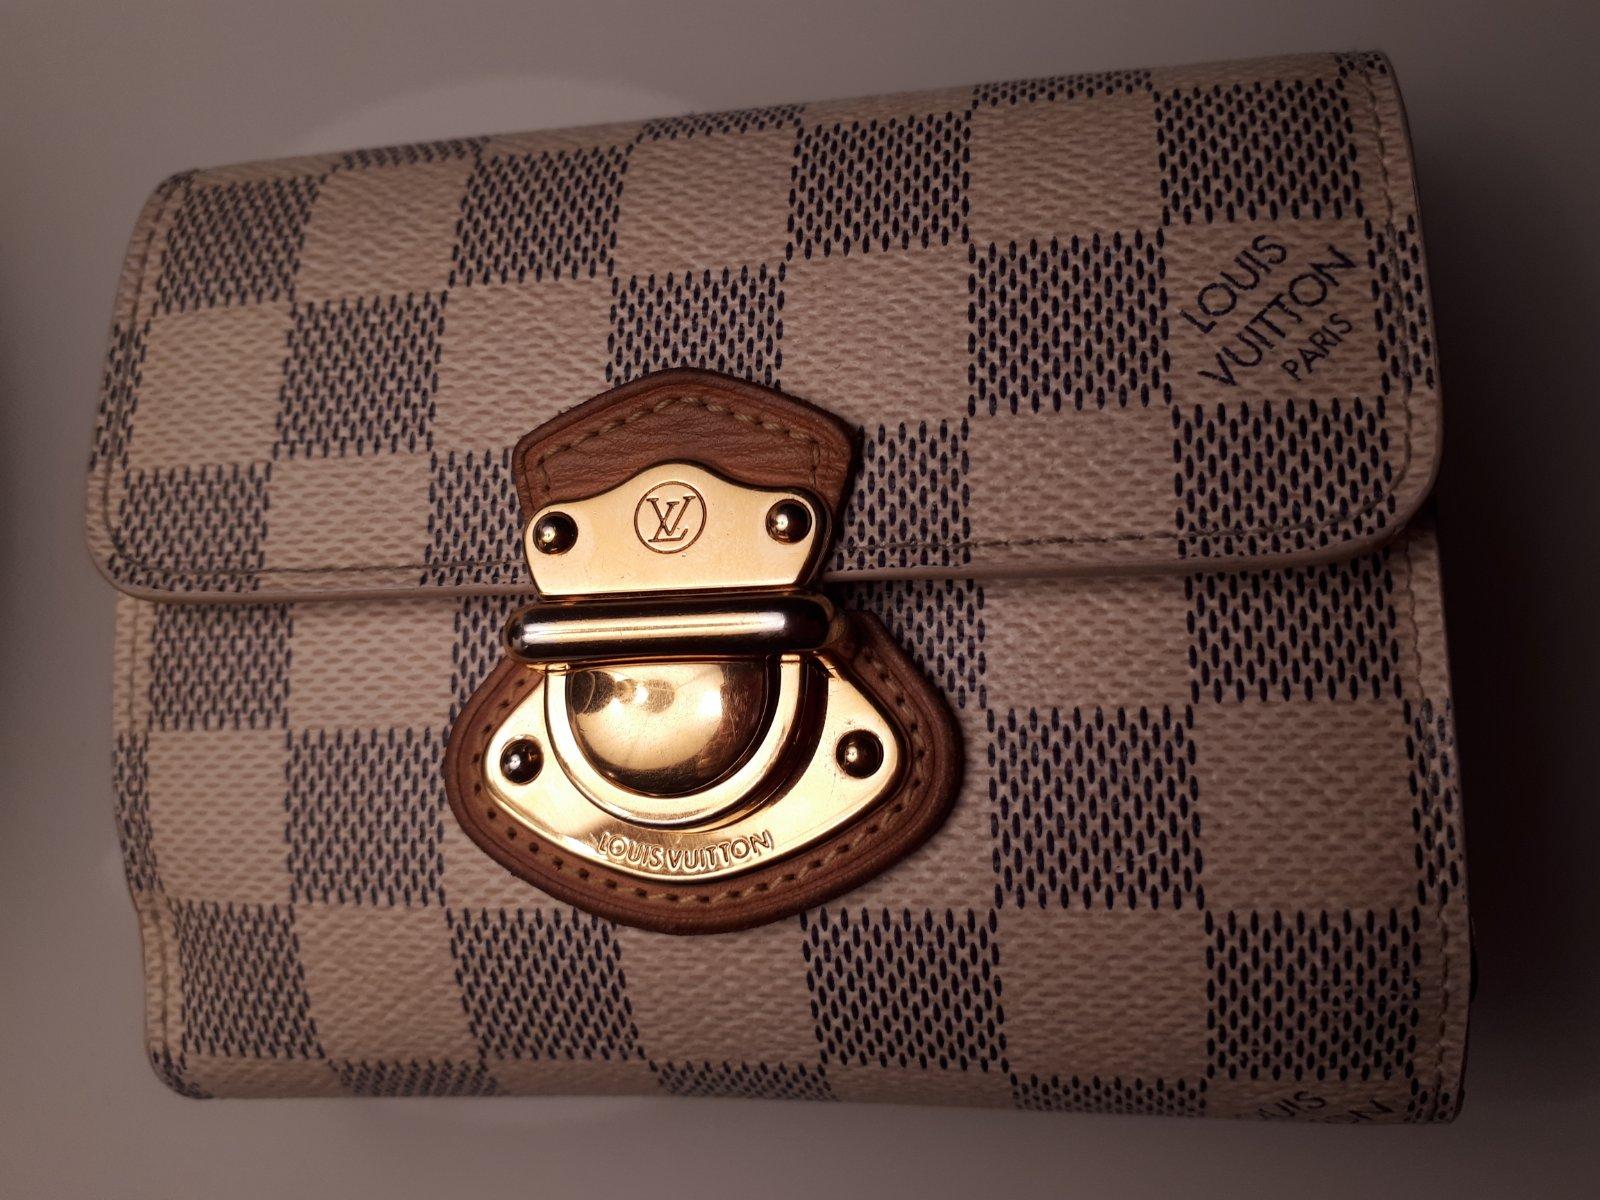 Lv peňaženka original damier azur wallet joey 68f5ce76de2